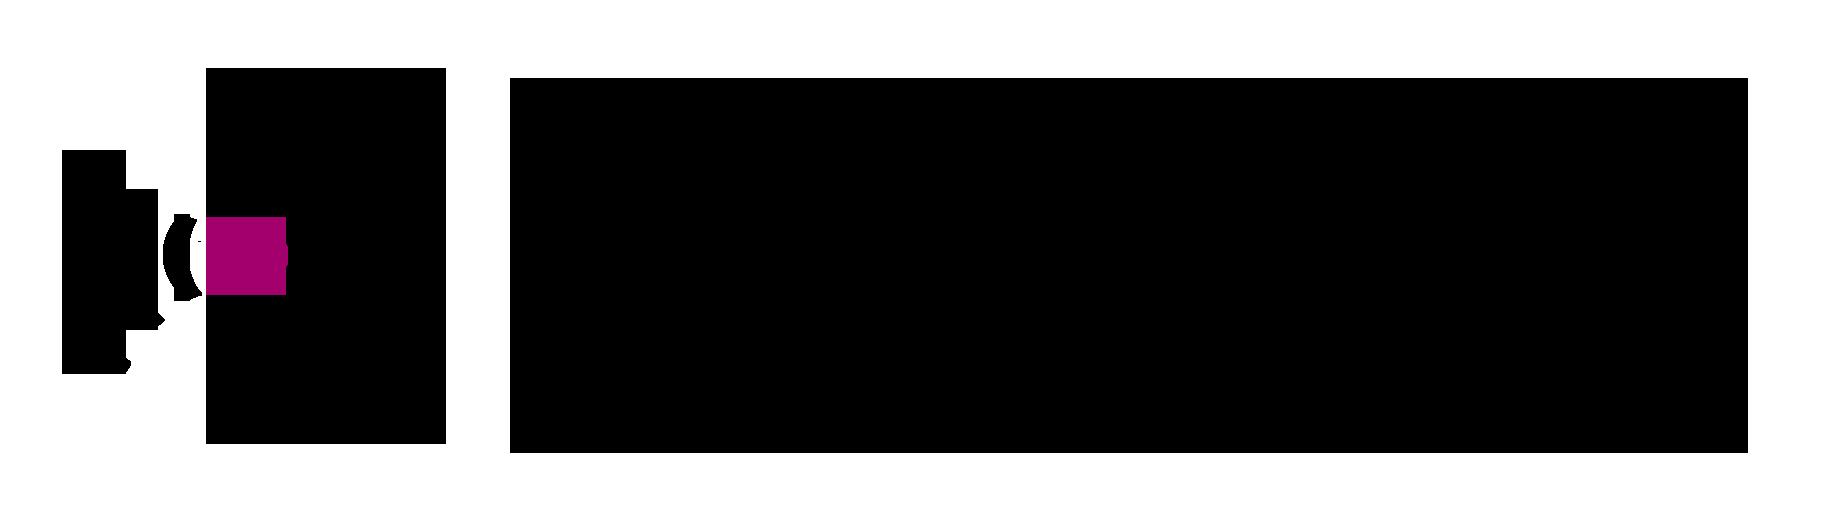 Dr. Woods Hearing Center, LLC. Logo